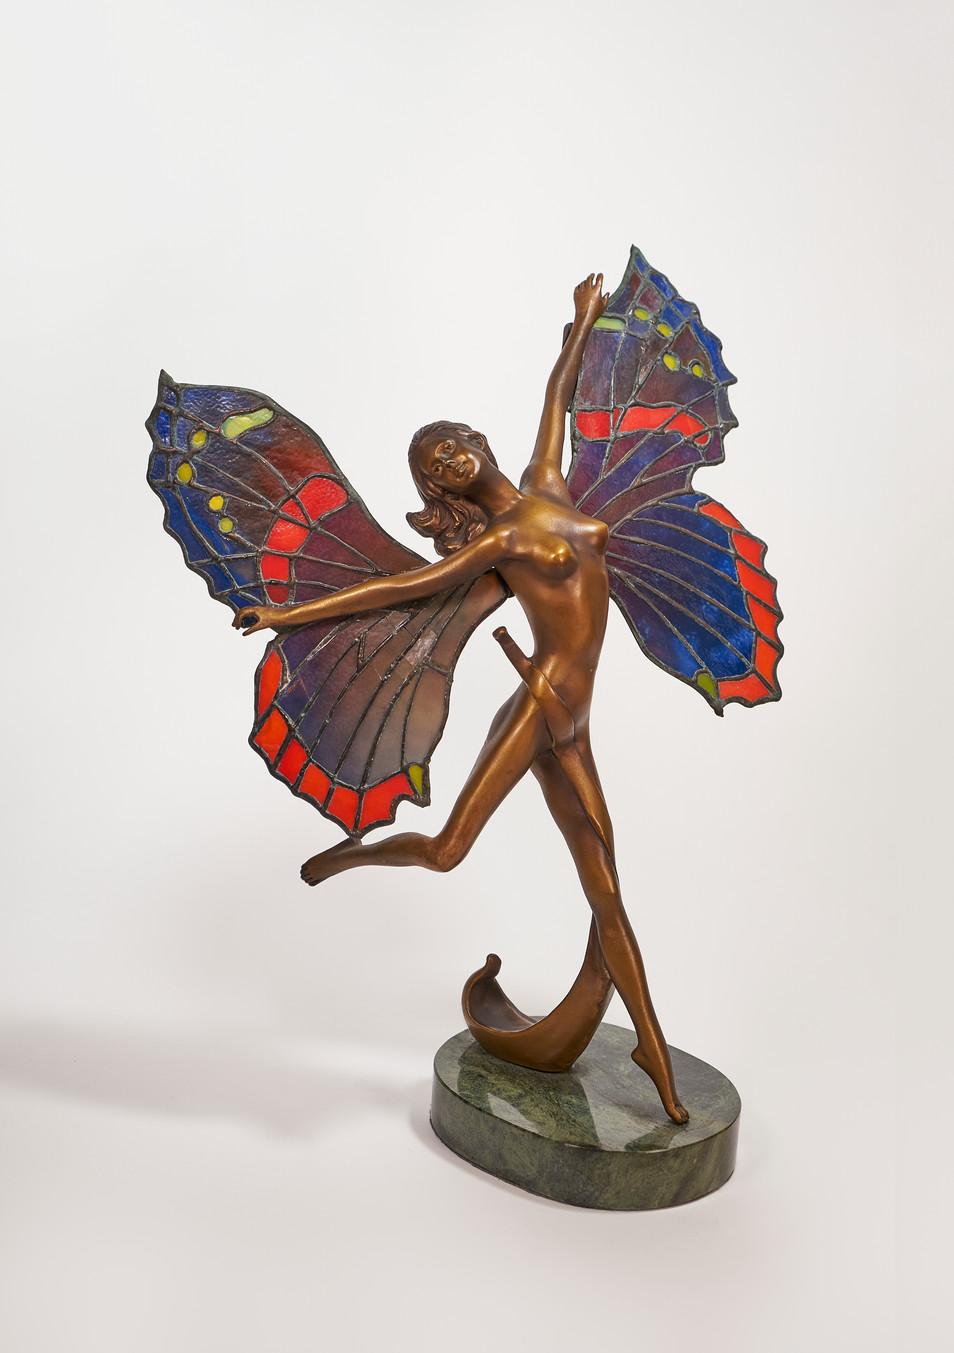 Adolph - Art Deco Butterfly Dancer